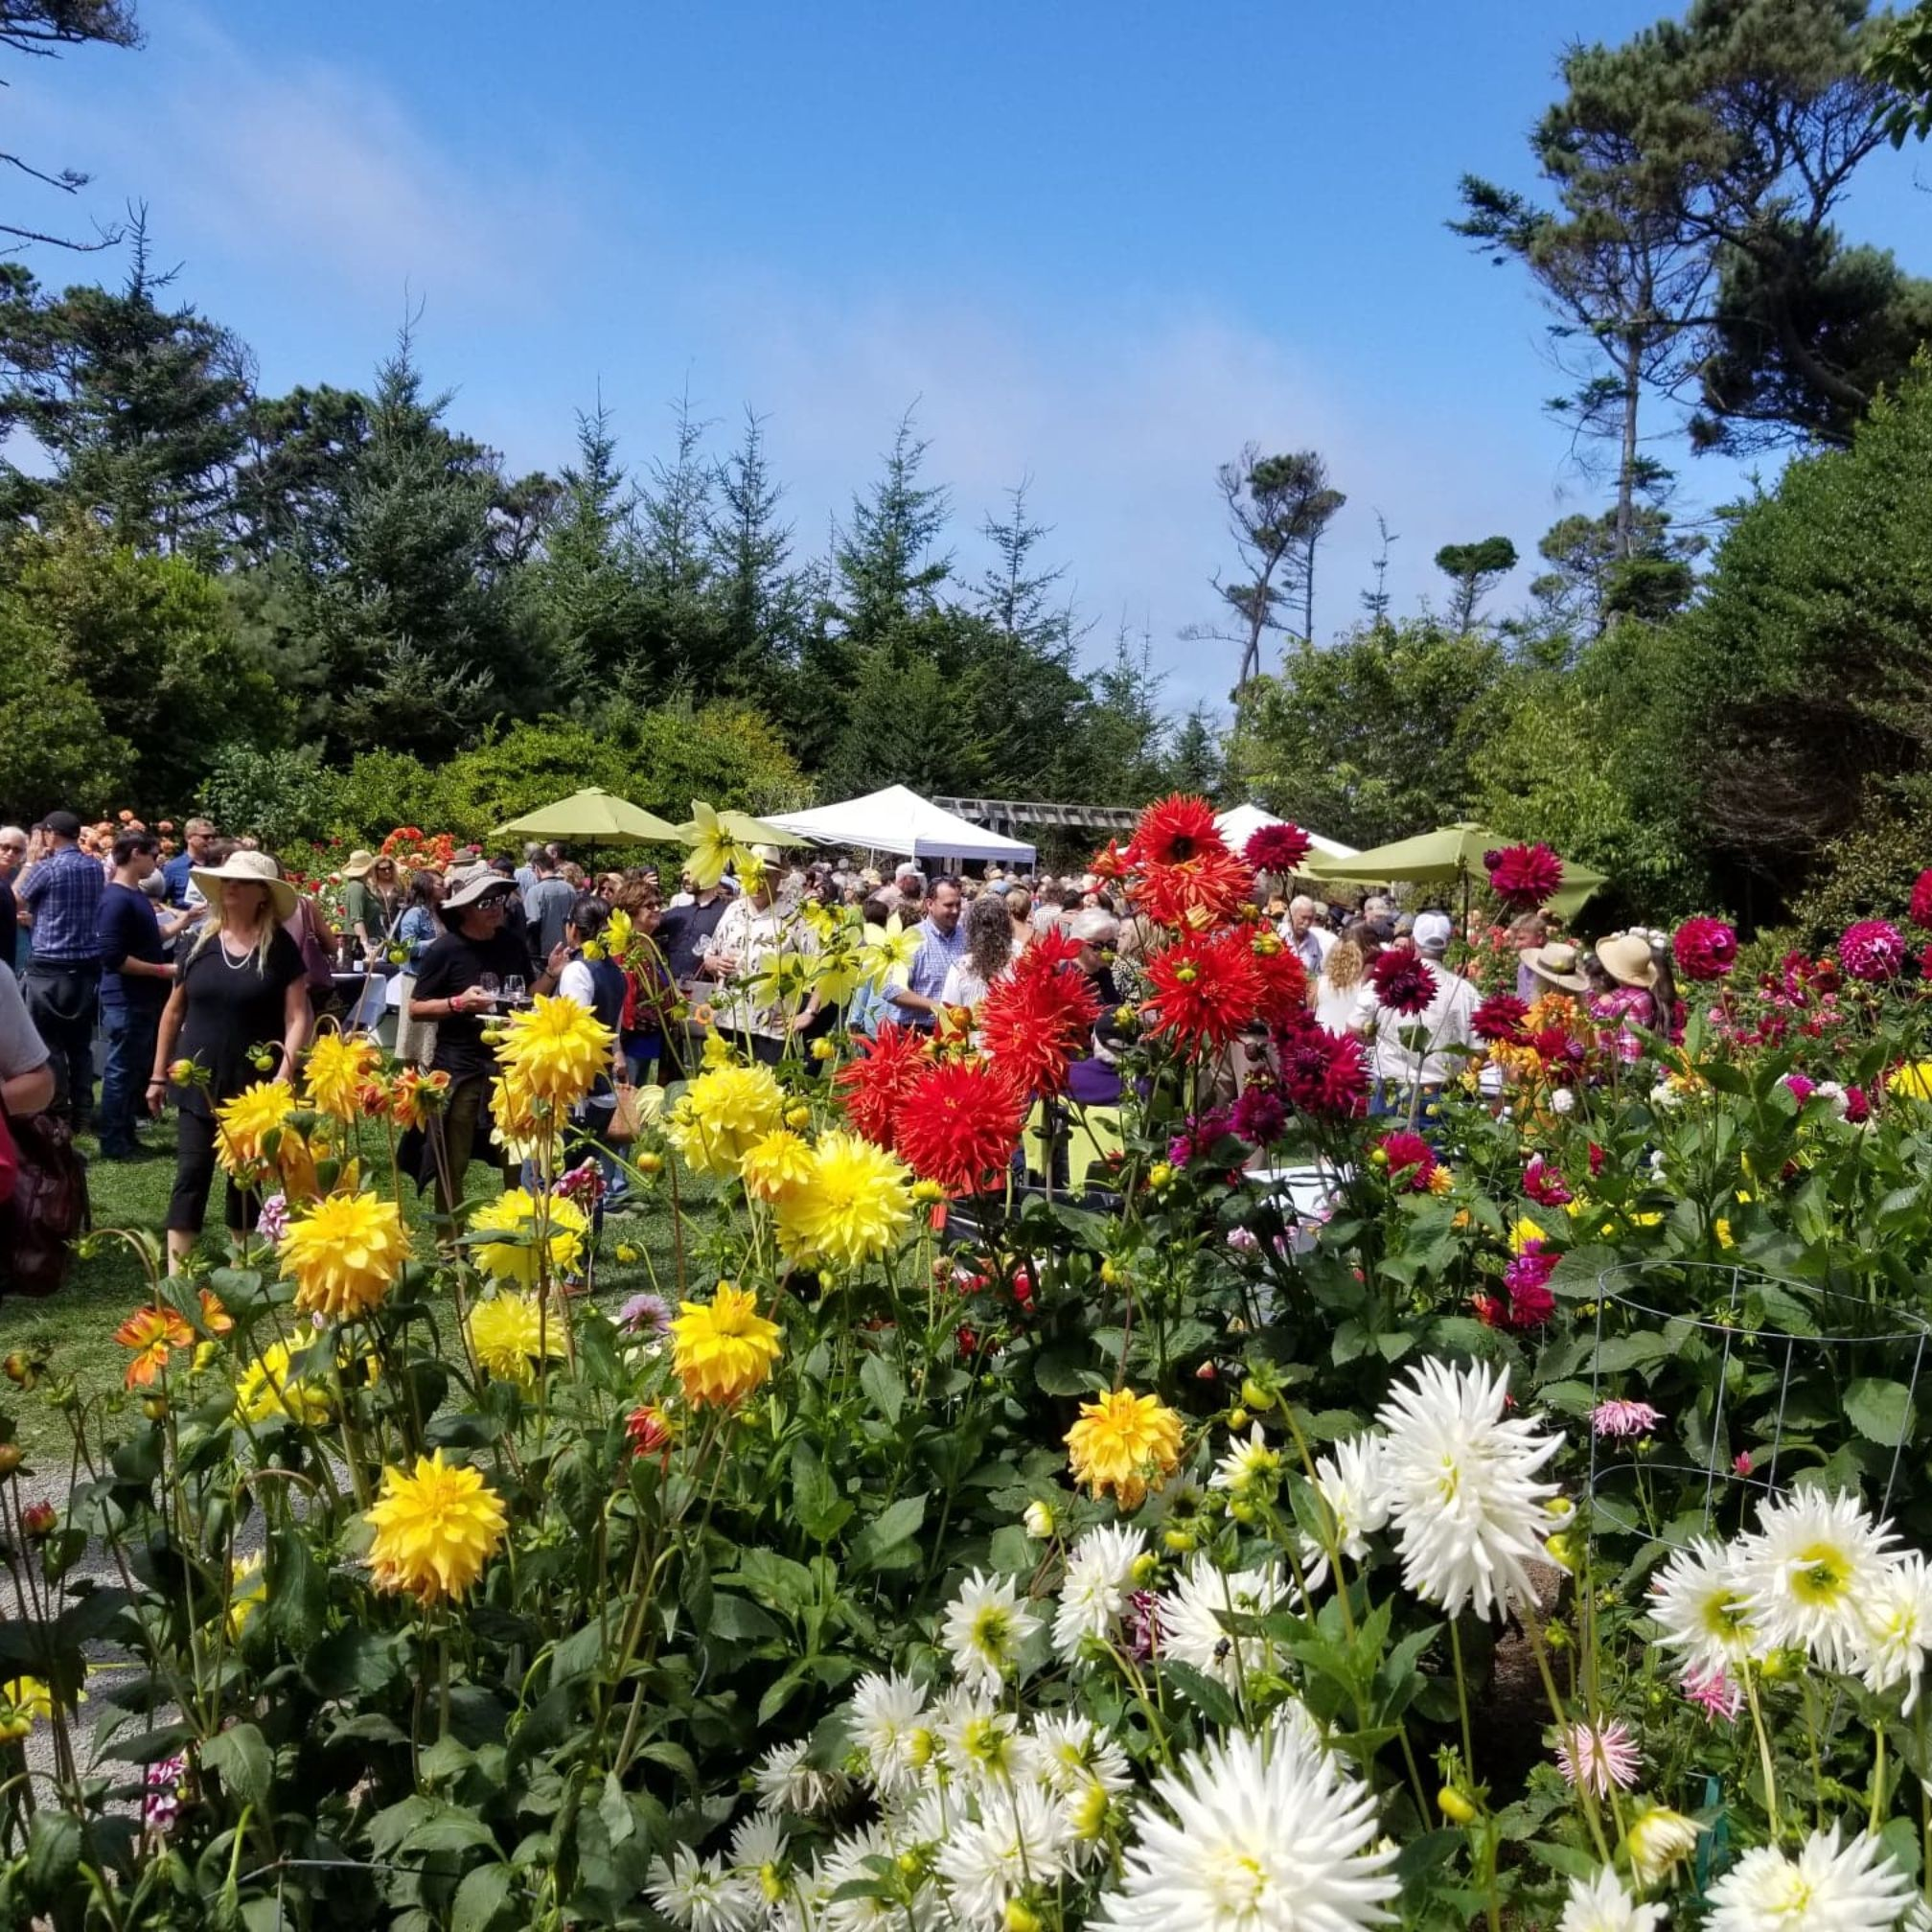 Colorful dahlias blooming at mendocino coast botanical